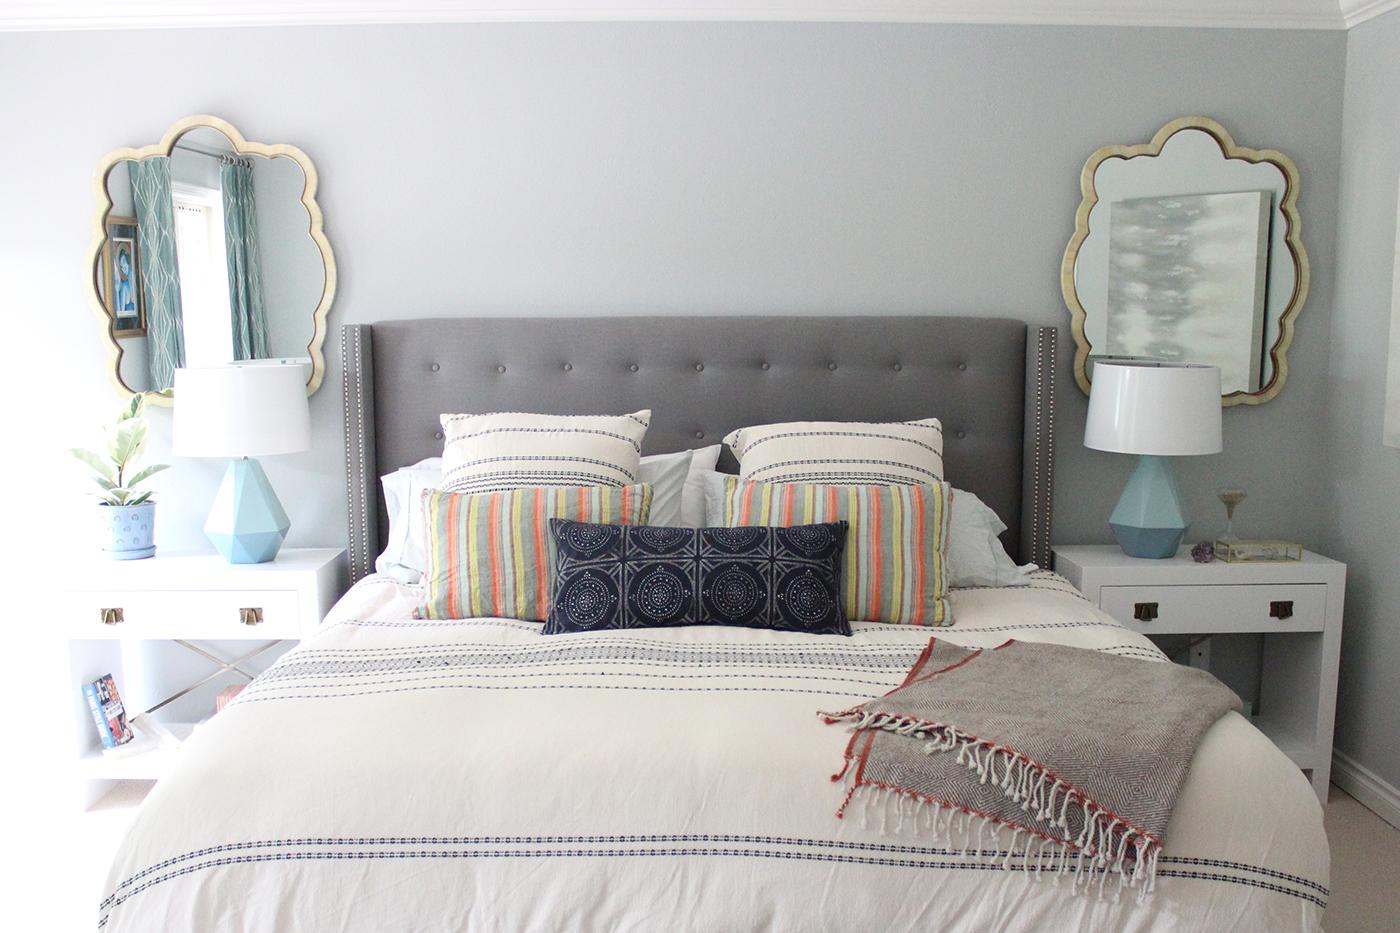 manderley-design-co-master-bedroom-1.jpg